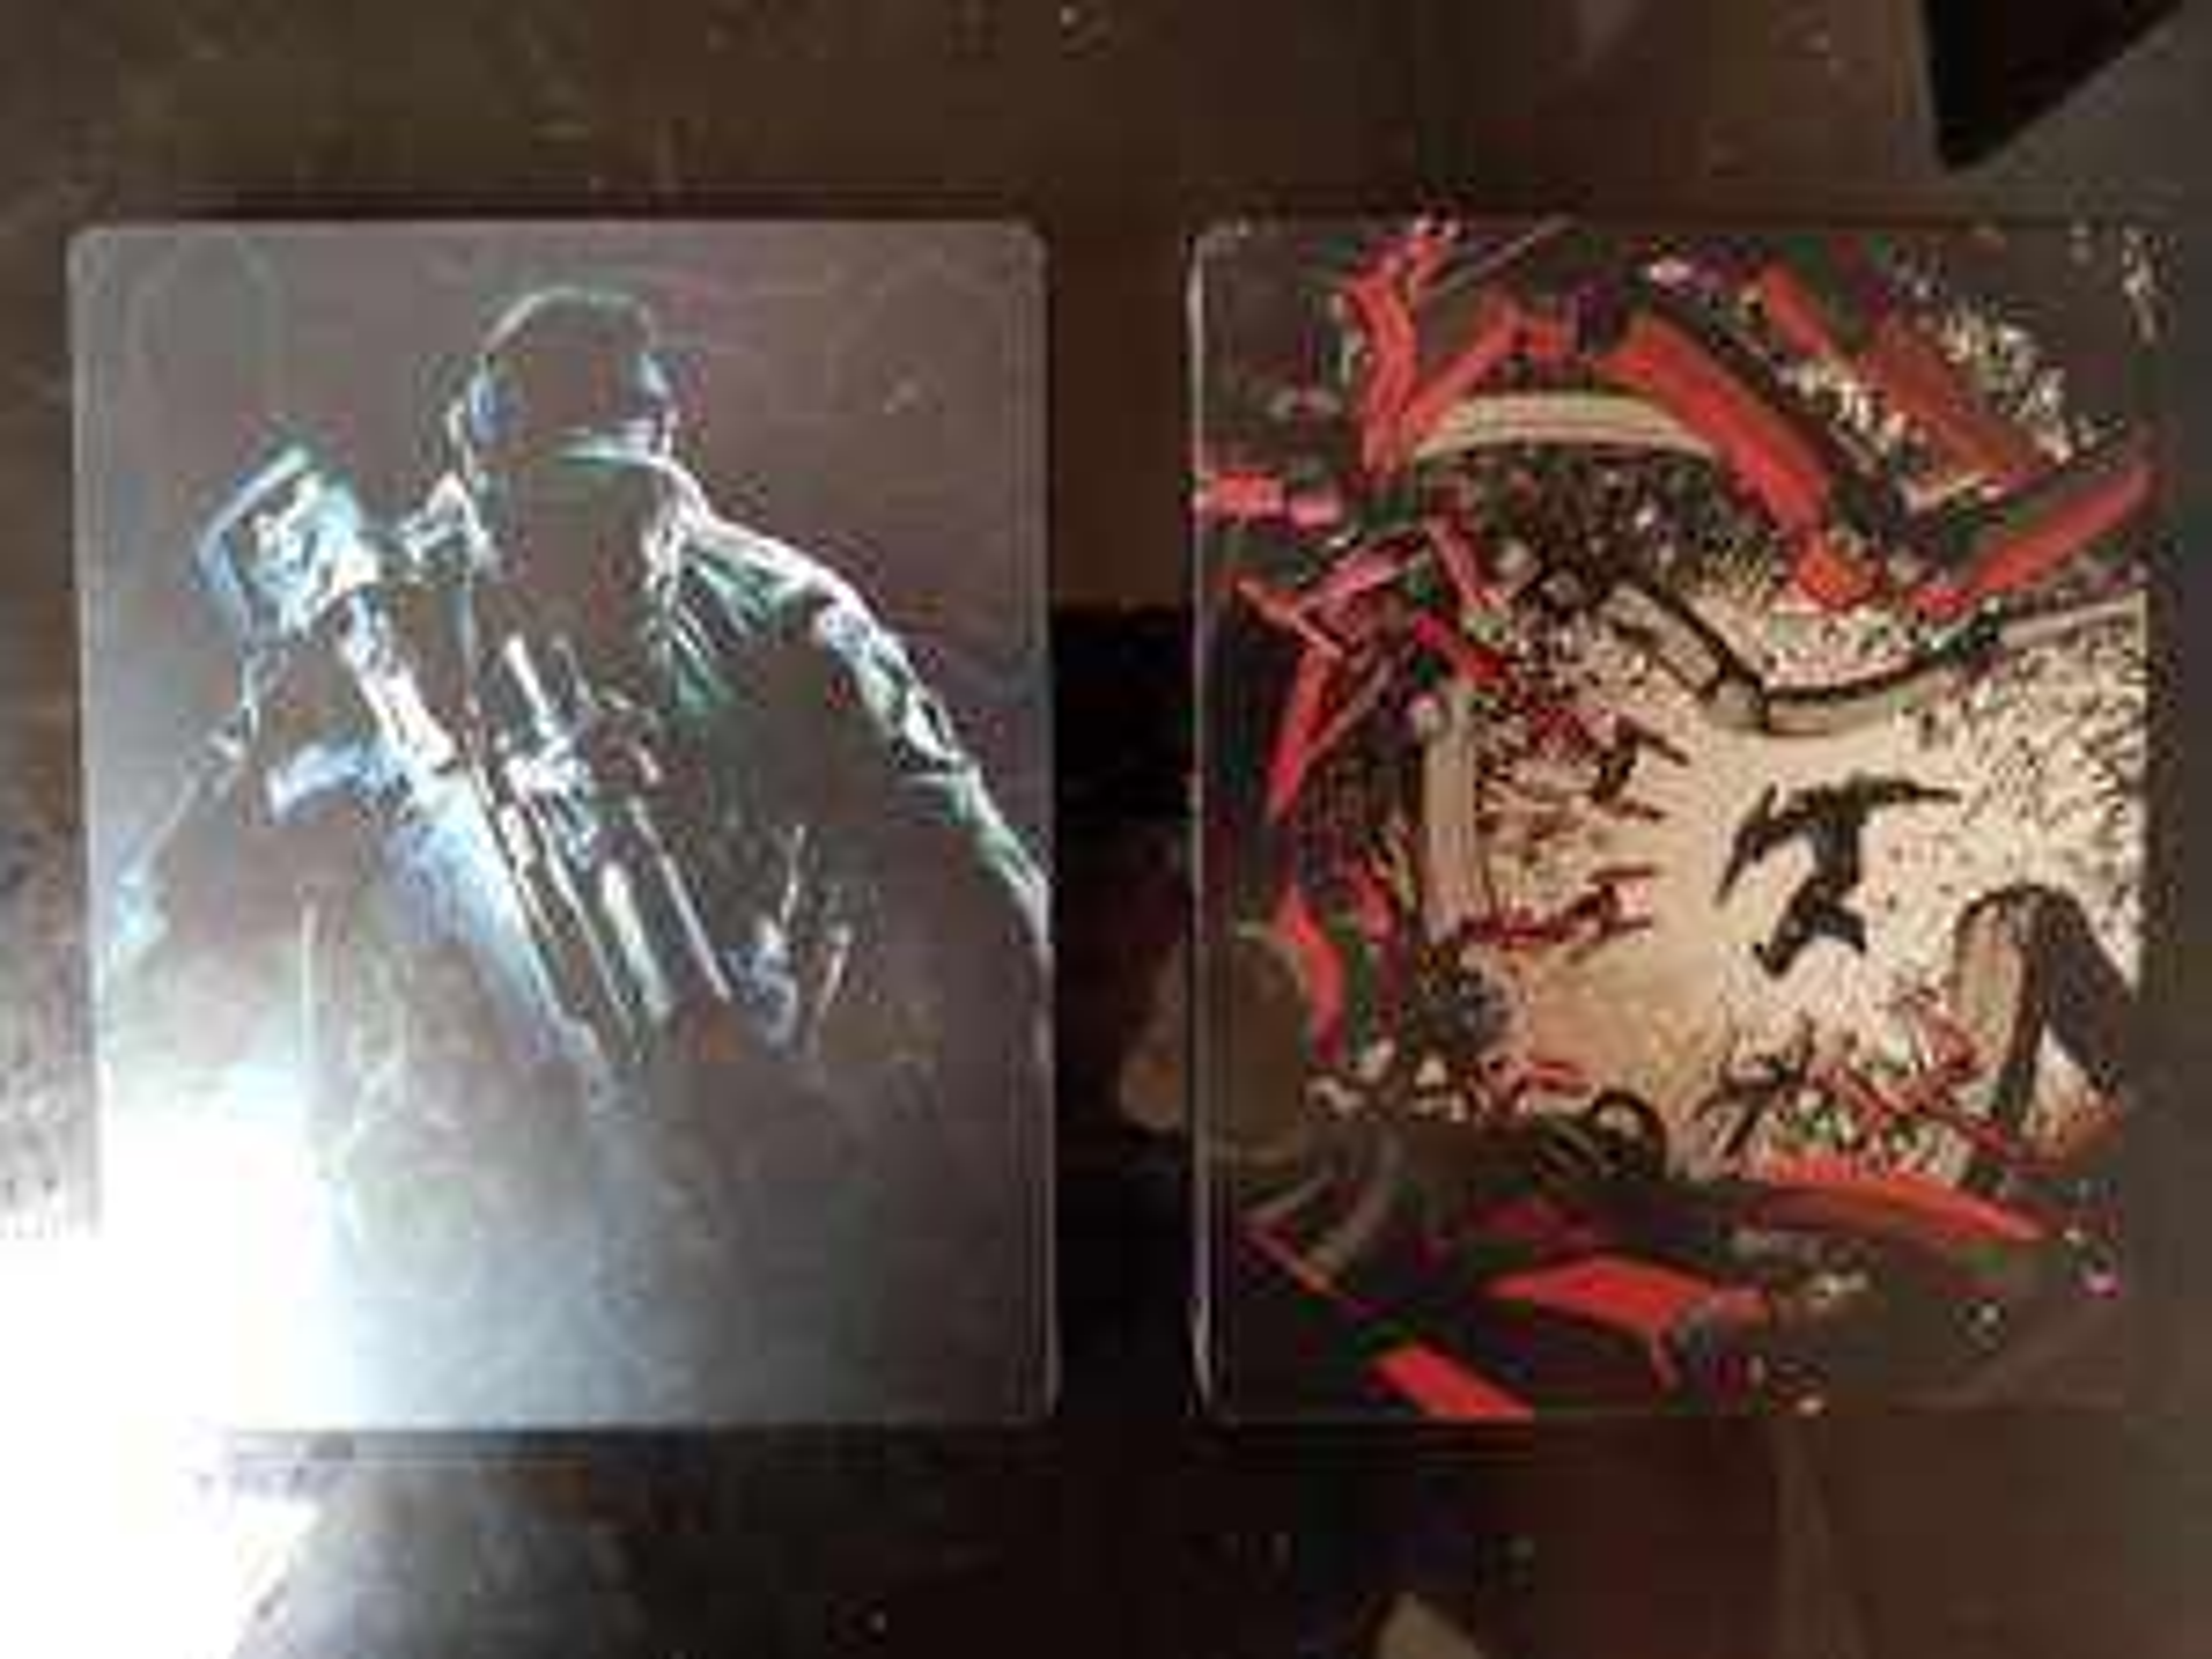 Steelbook Sniper: Ghost Warrior 3 ou The Surge gratuits